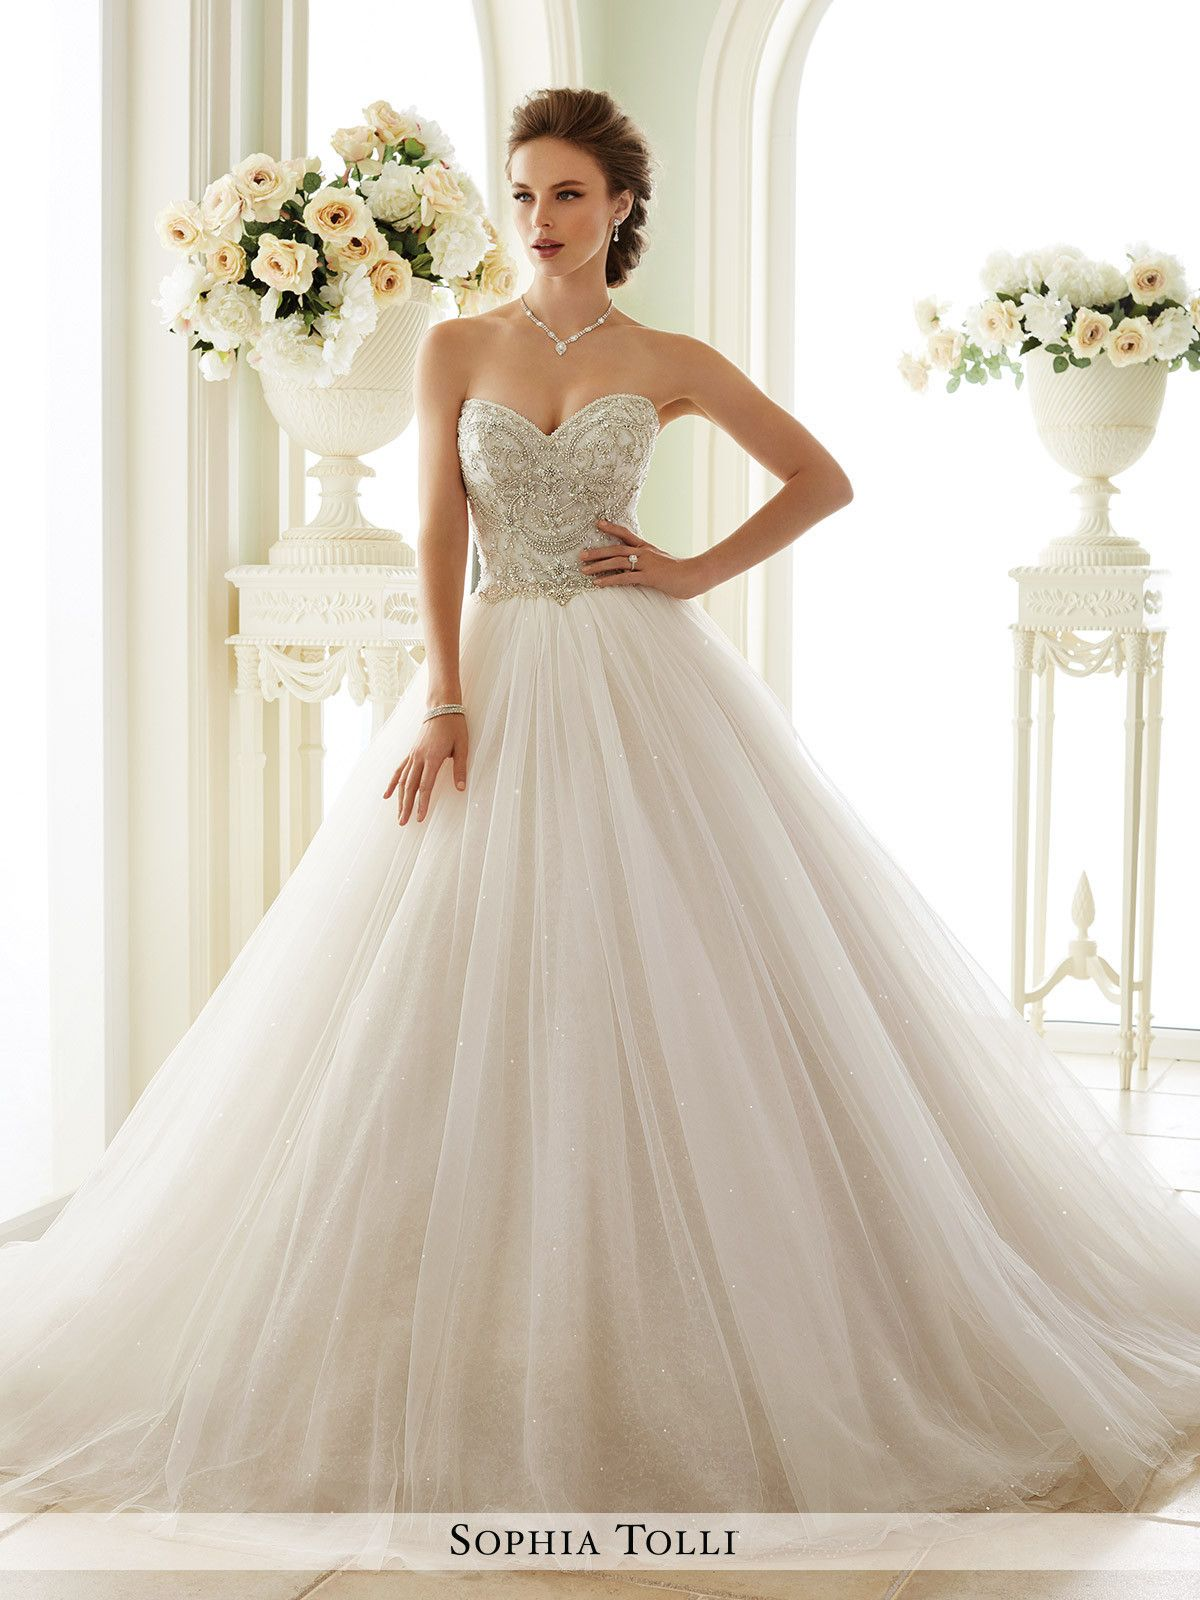 Wedding dresses rental  Sophia Tolli  Novella  Y  All Dressed Up Bridal Gown